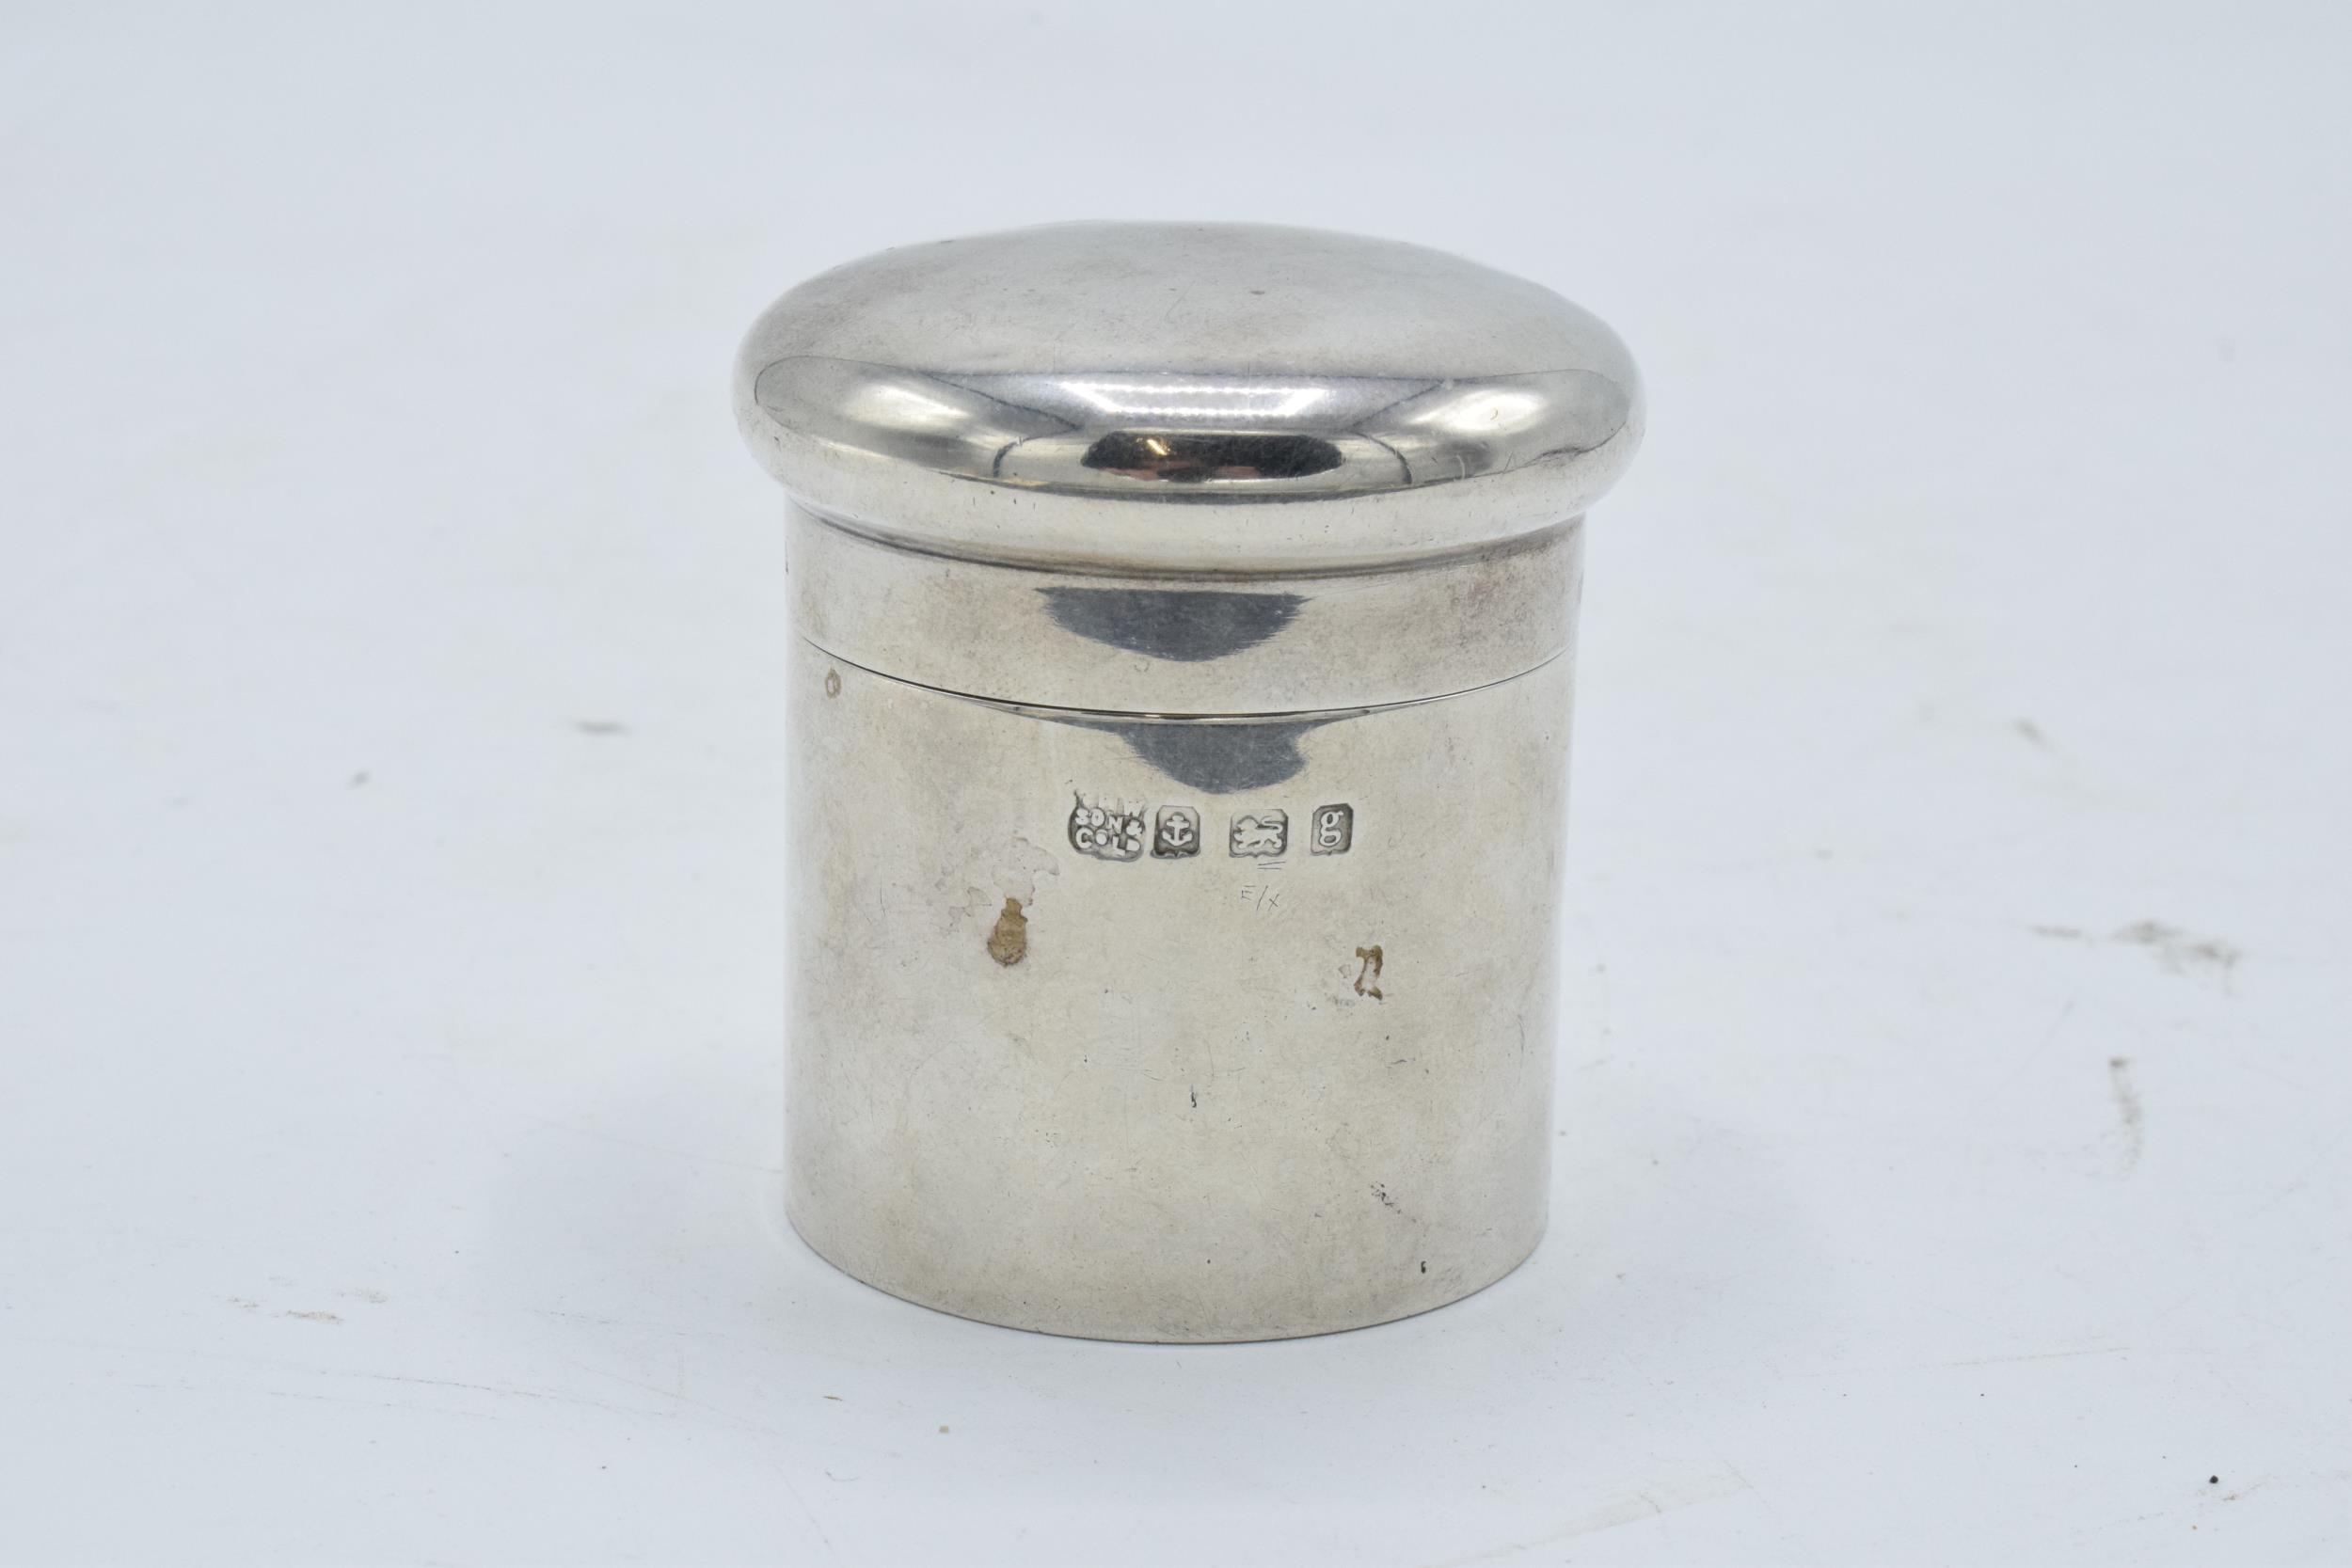 Silver cylindrical lidded pot/ box. Birmingham 1906. 45.4 grams. 5.5cm tall.